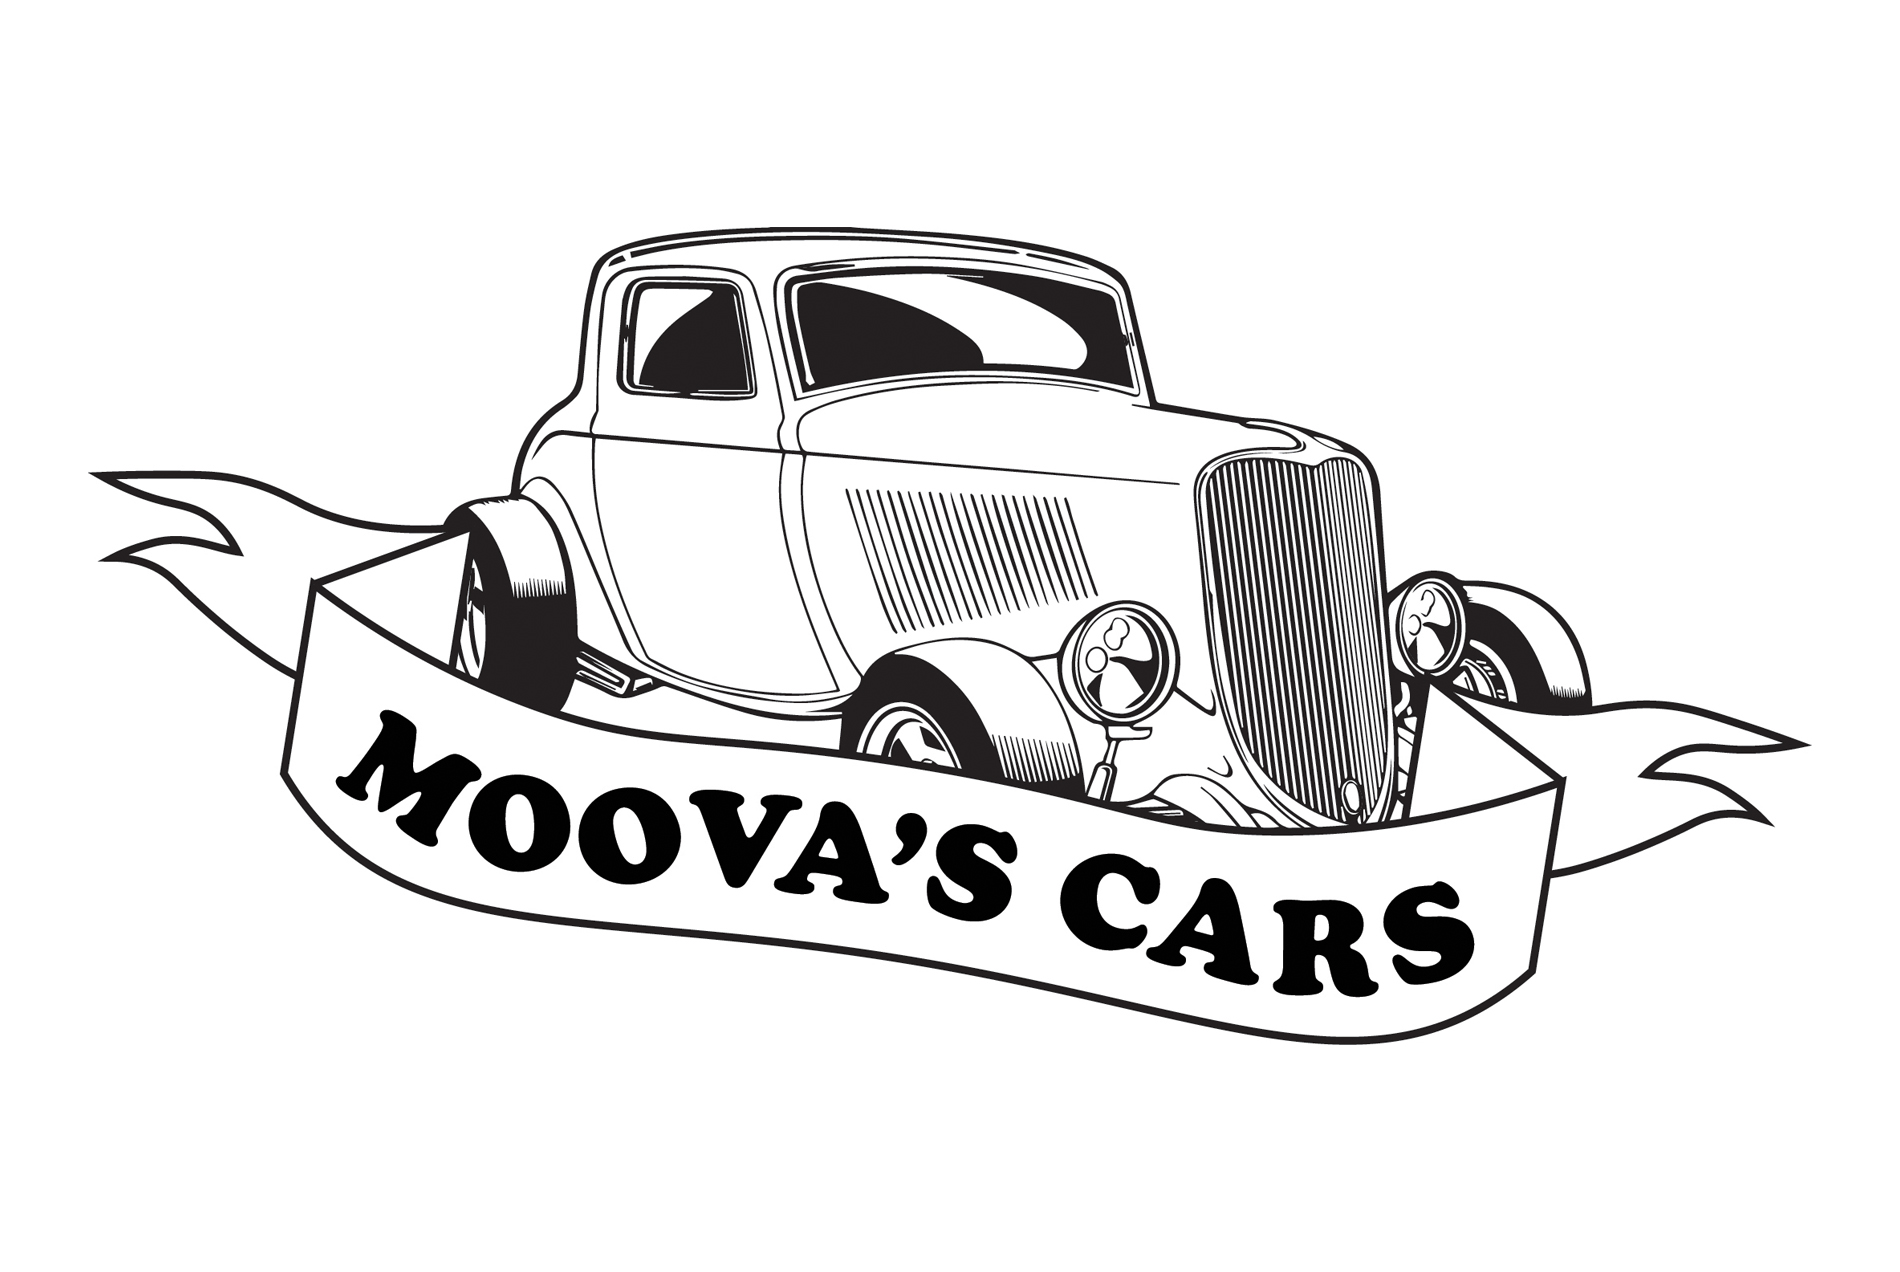 Moova car